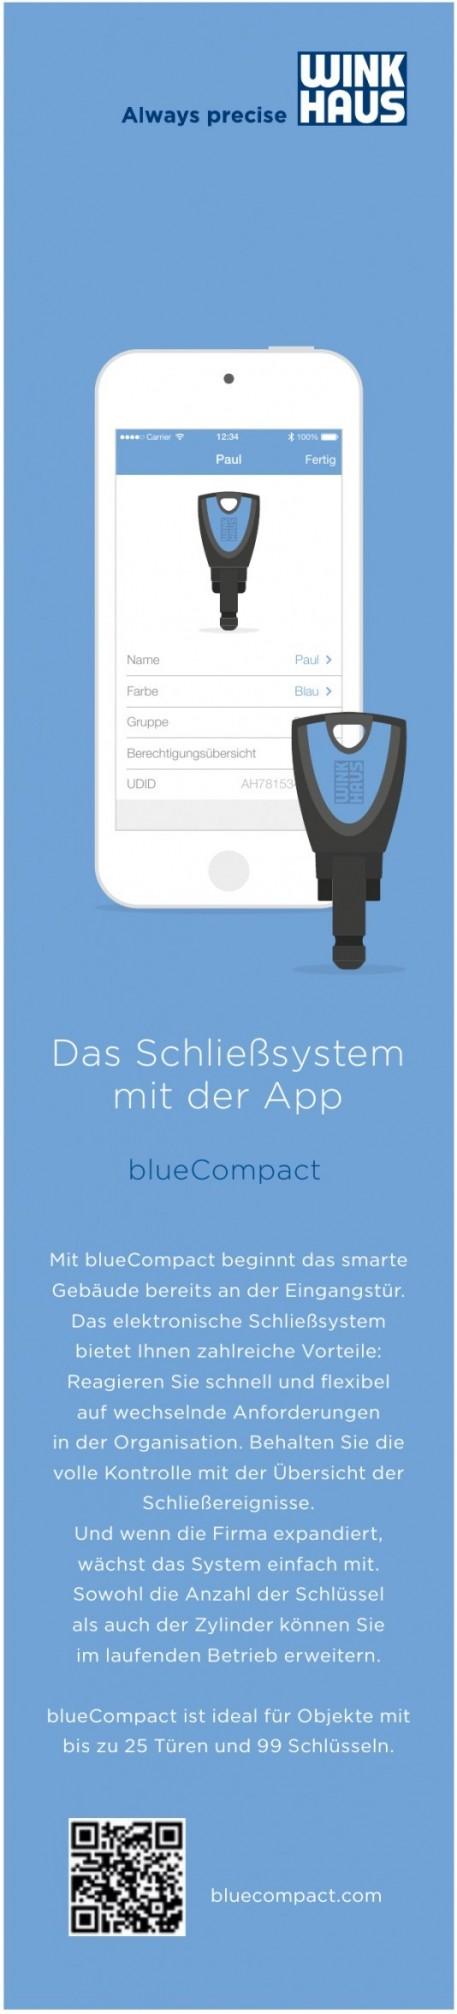 Wink Haus - blueCompact